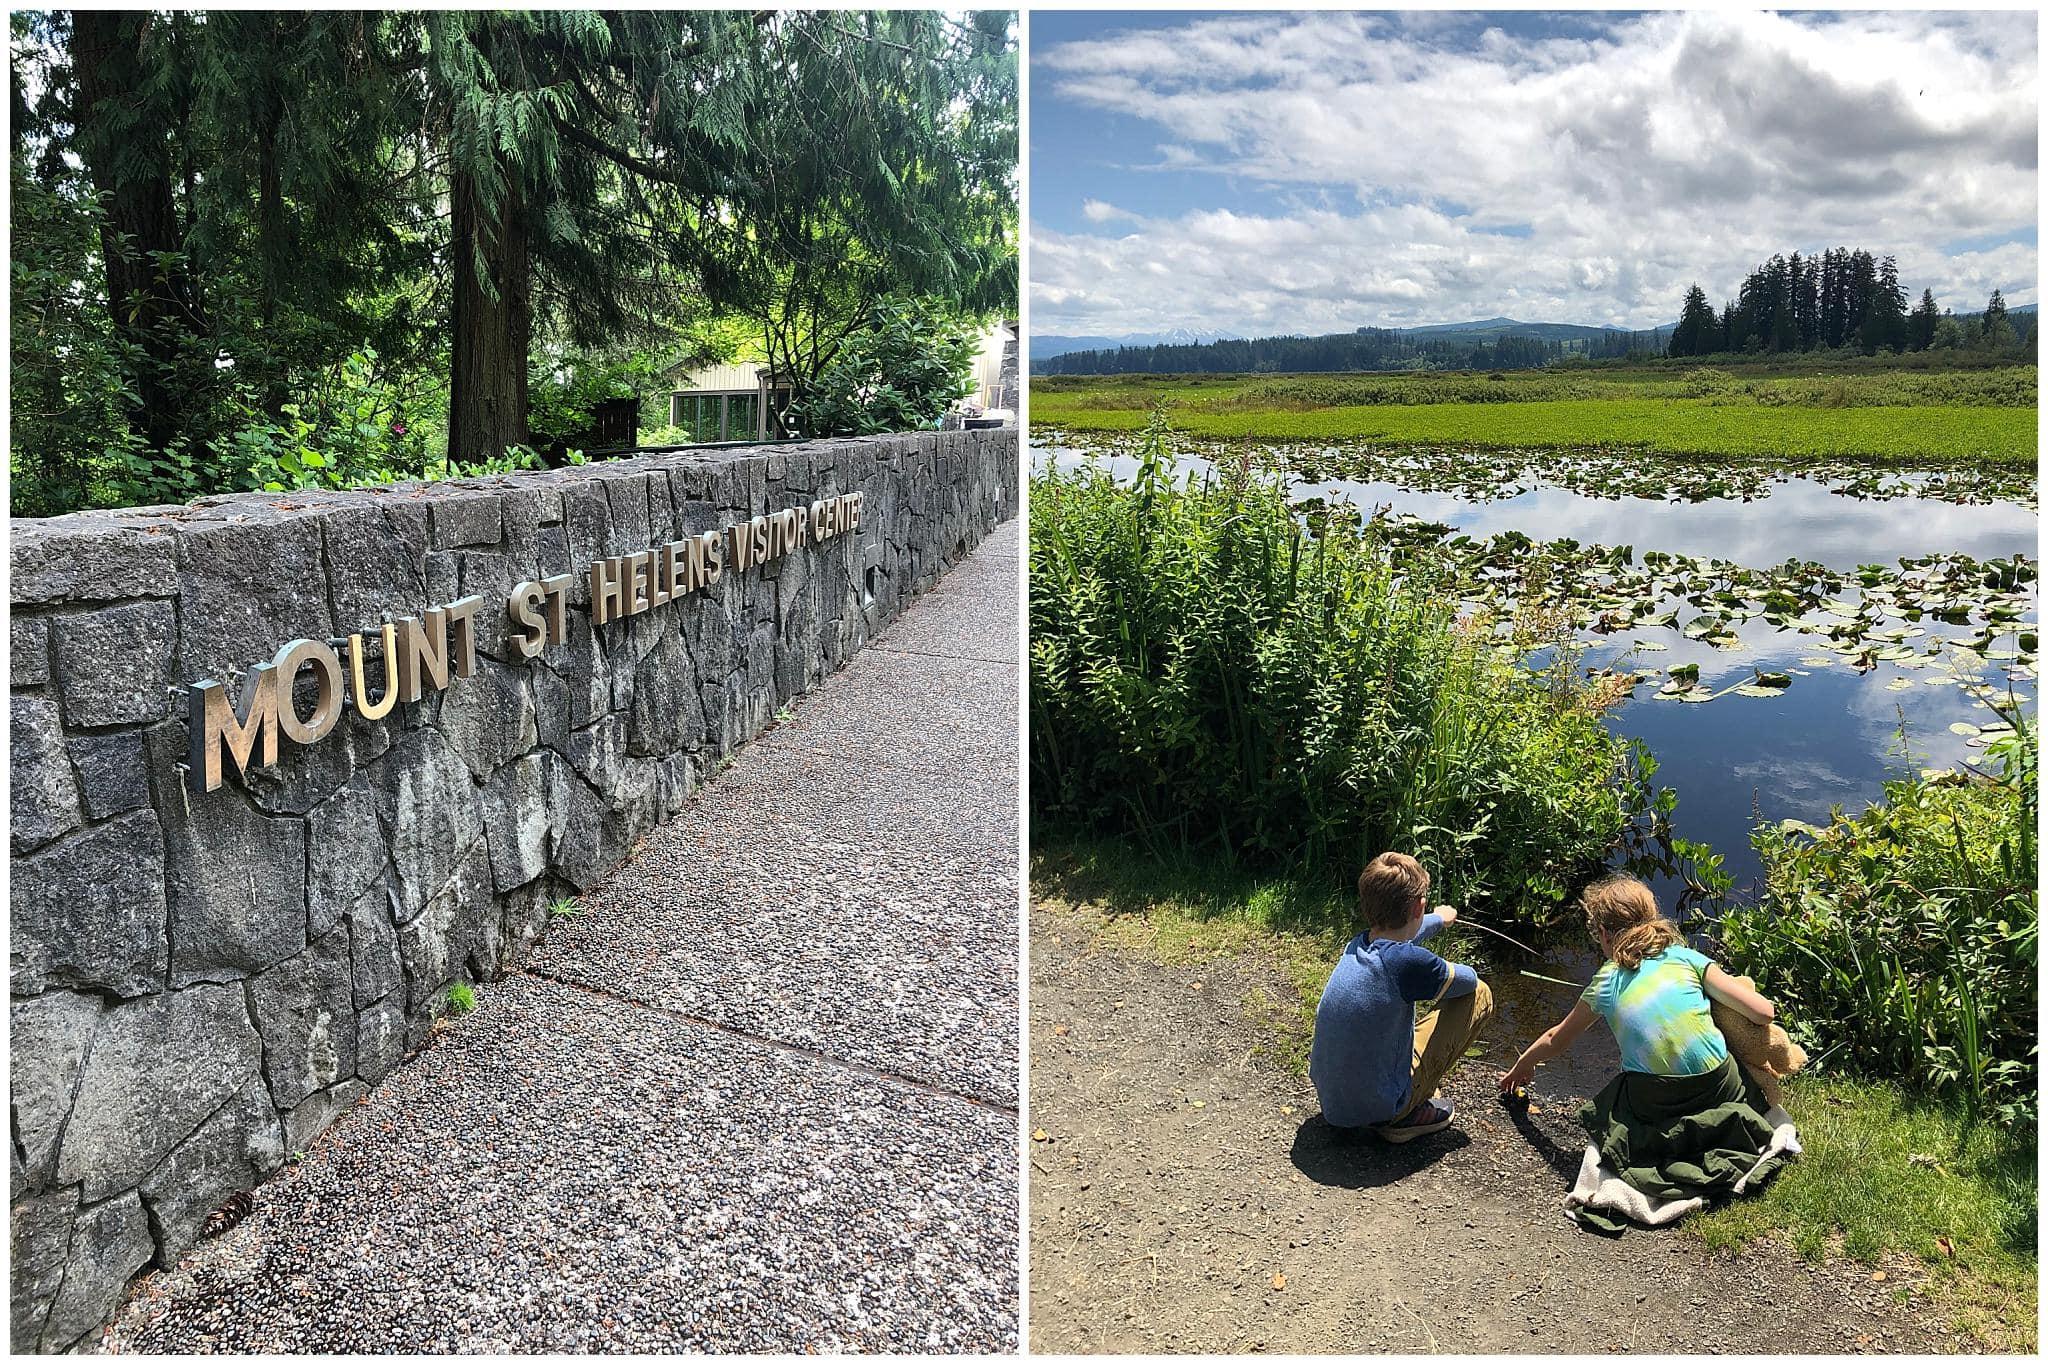 Kids exploring nature at Mount Saint Helens visitor center